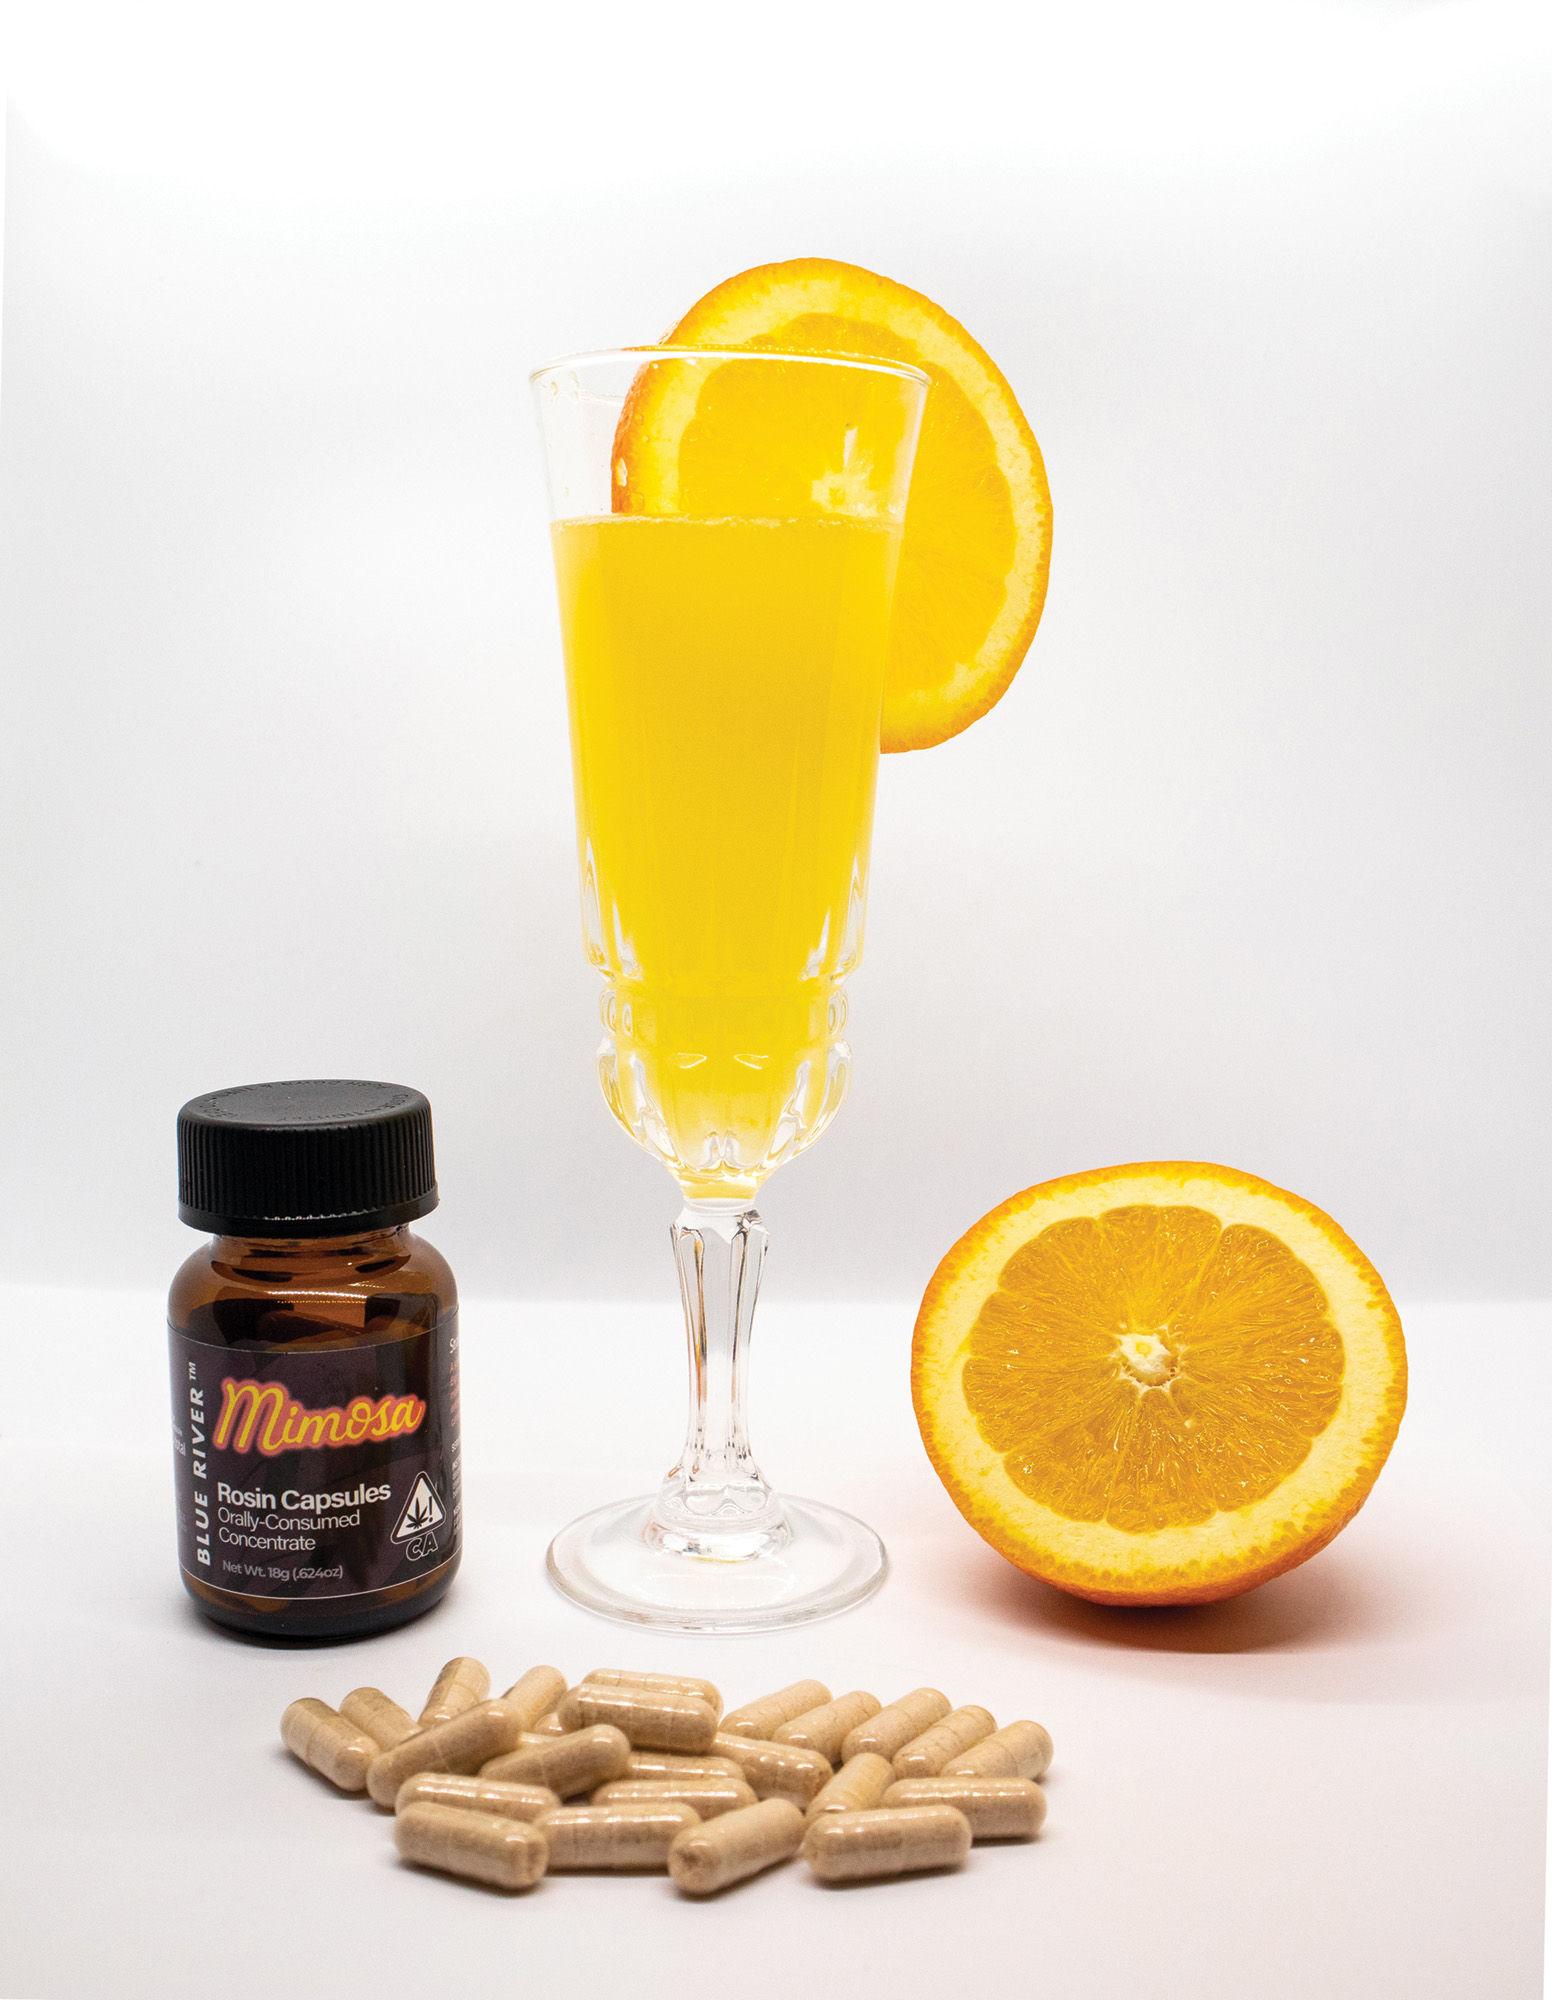 Mimosa Rosin Capsules